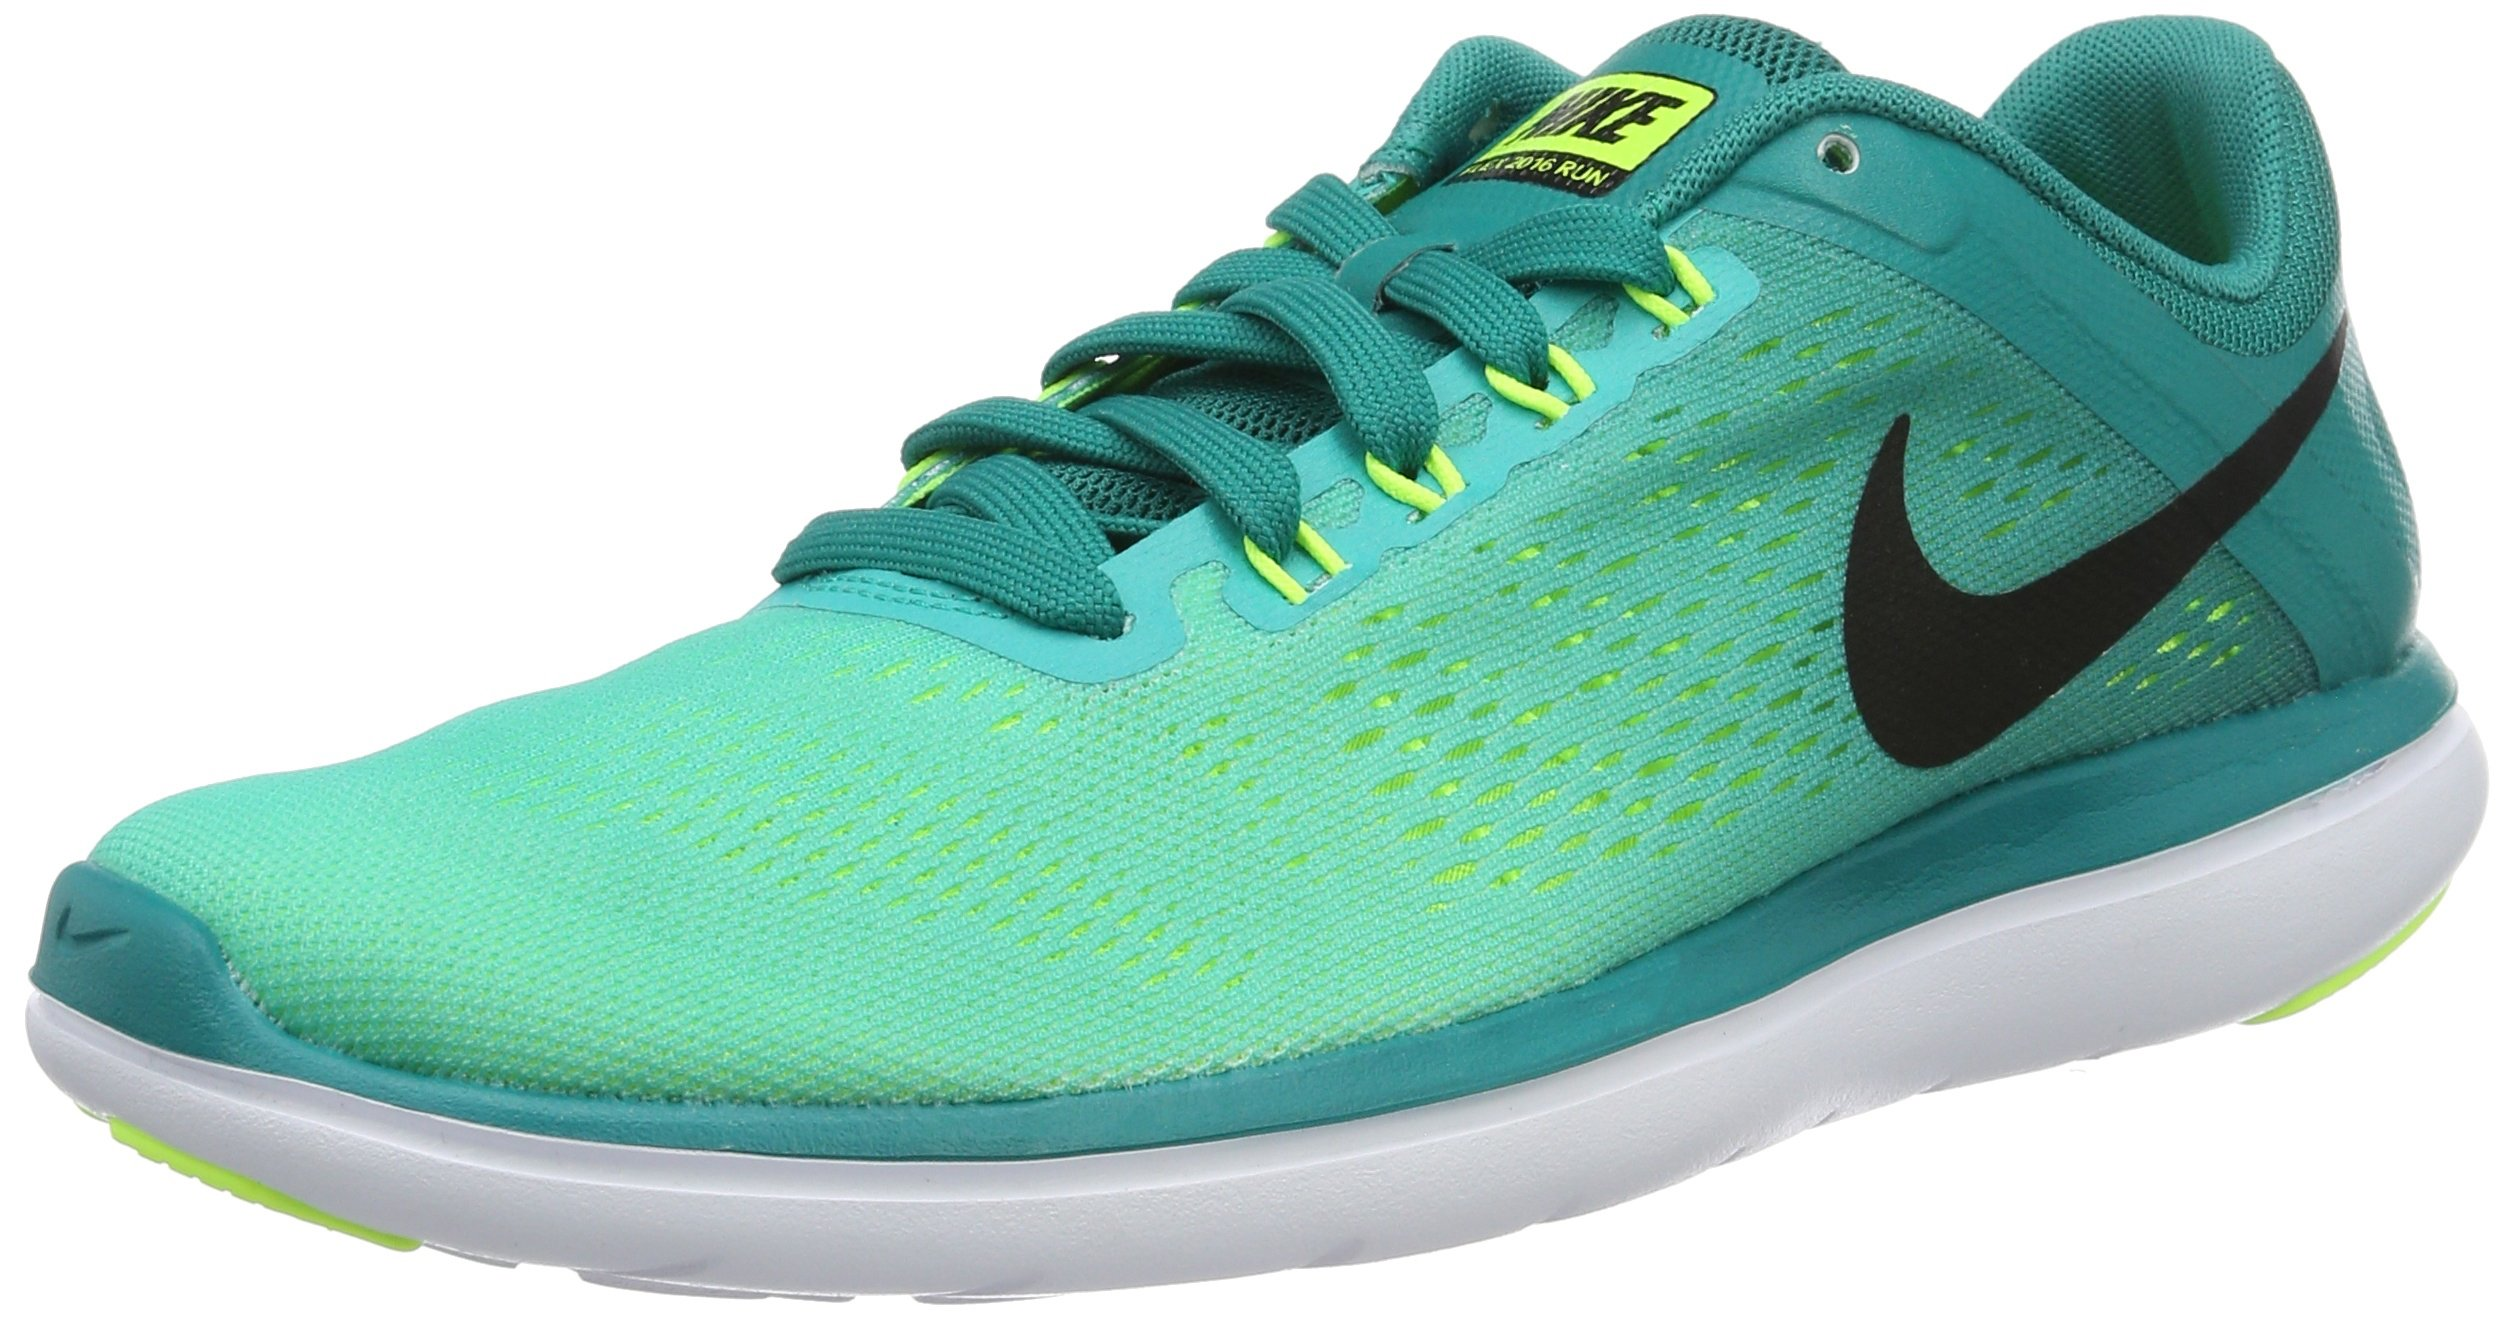 Nike Men's Flex RN 2016 Rio Teal/Black/Clear Jade/Volt Nylon Running Shoes 10.5 M US